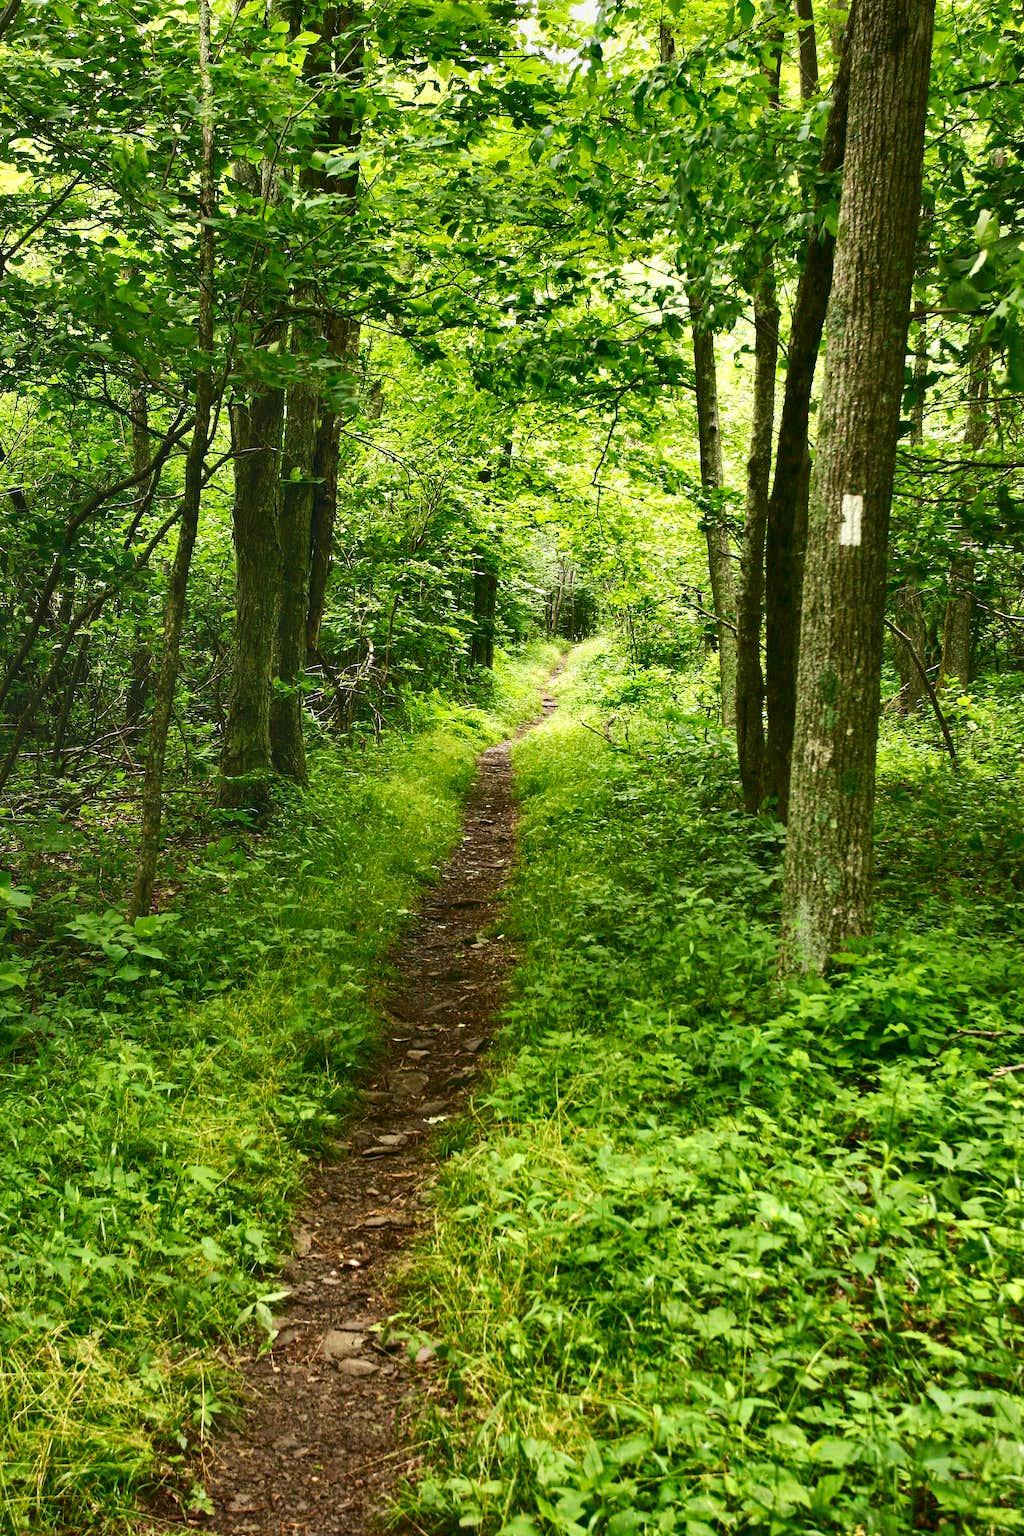 Appalachian Trail in Shenandoah